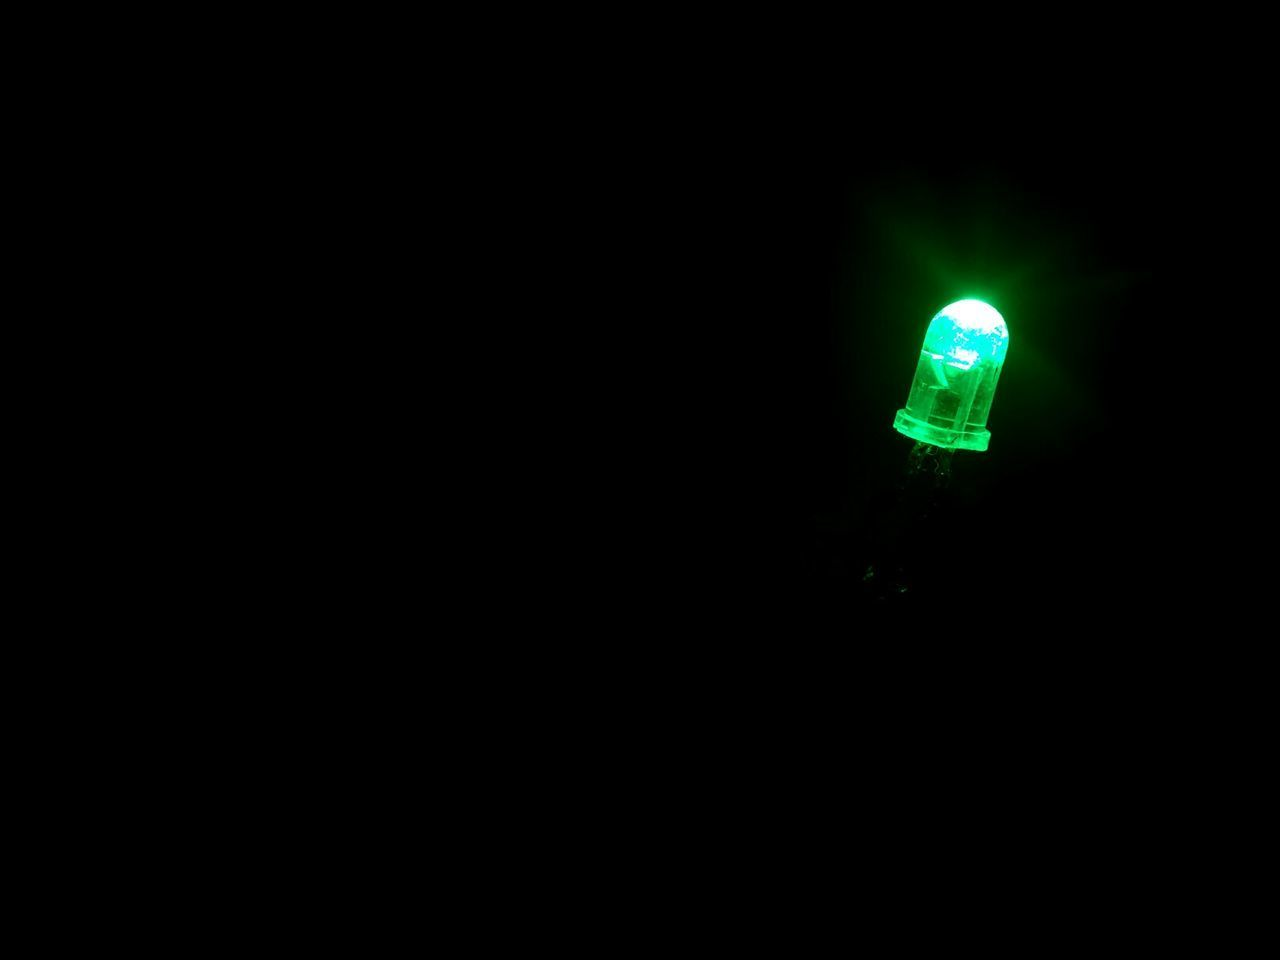 Illuminated Lighting Equipment Night No People Simplicity Simple Photography Black Background Light Colors Eletronica LED Led Lights  Green Light Green Color Photographymobile Led Lights  Low Light EyeEmNewHere TheWeekOnEyeEM